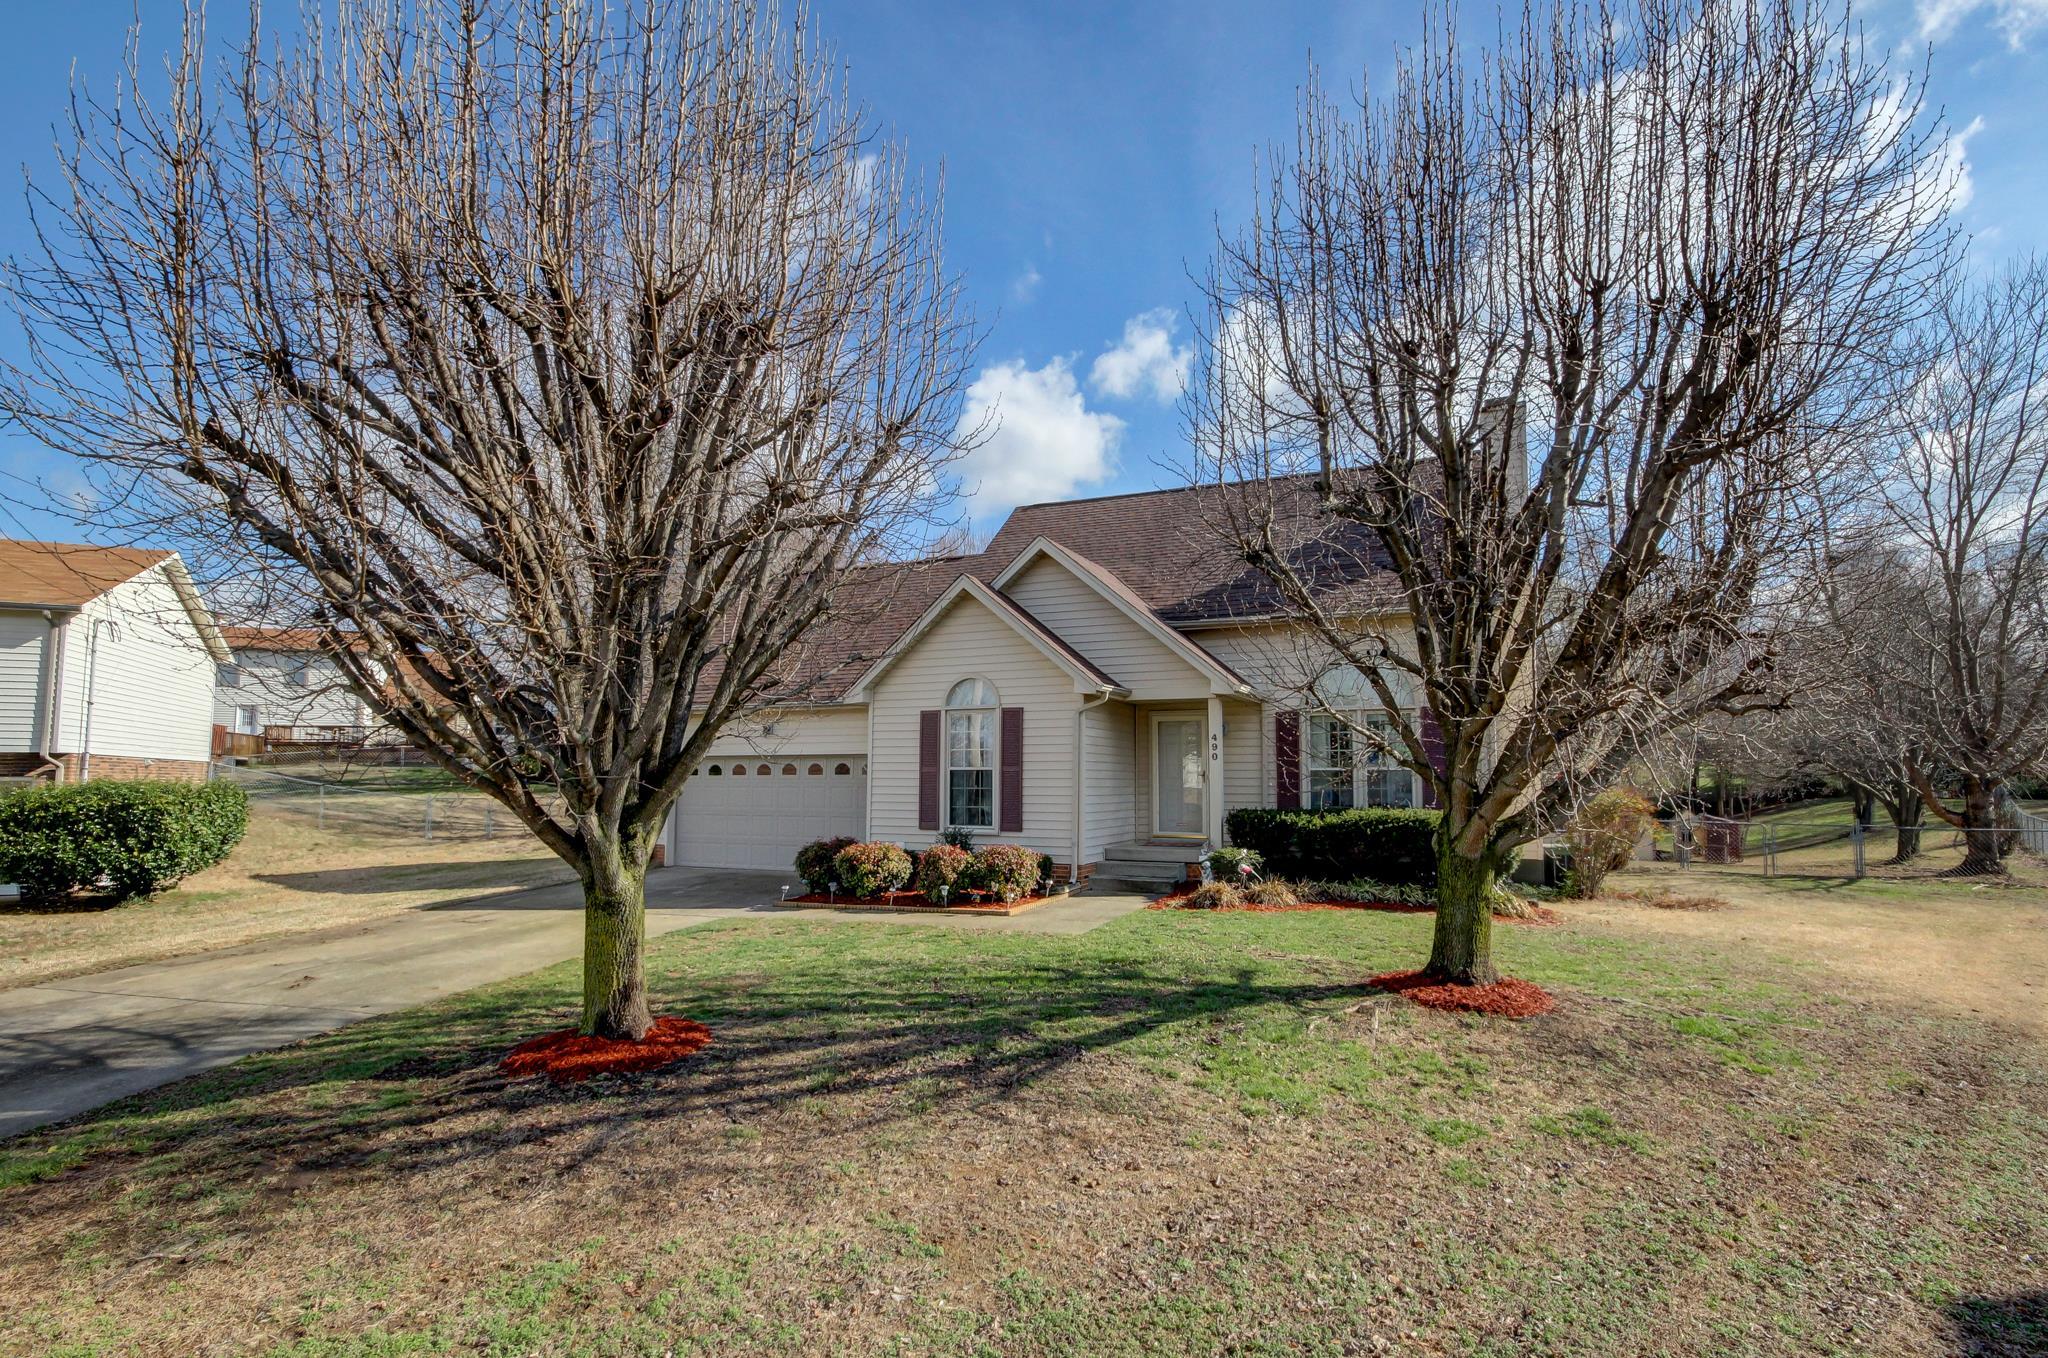 490 Steffi St, Clarksville, TN 37040